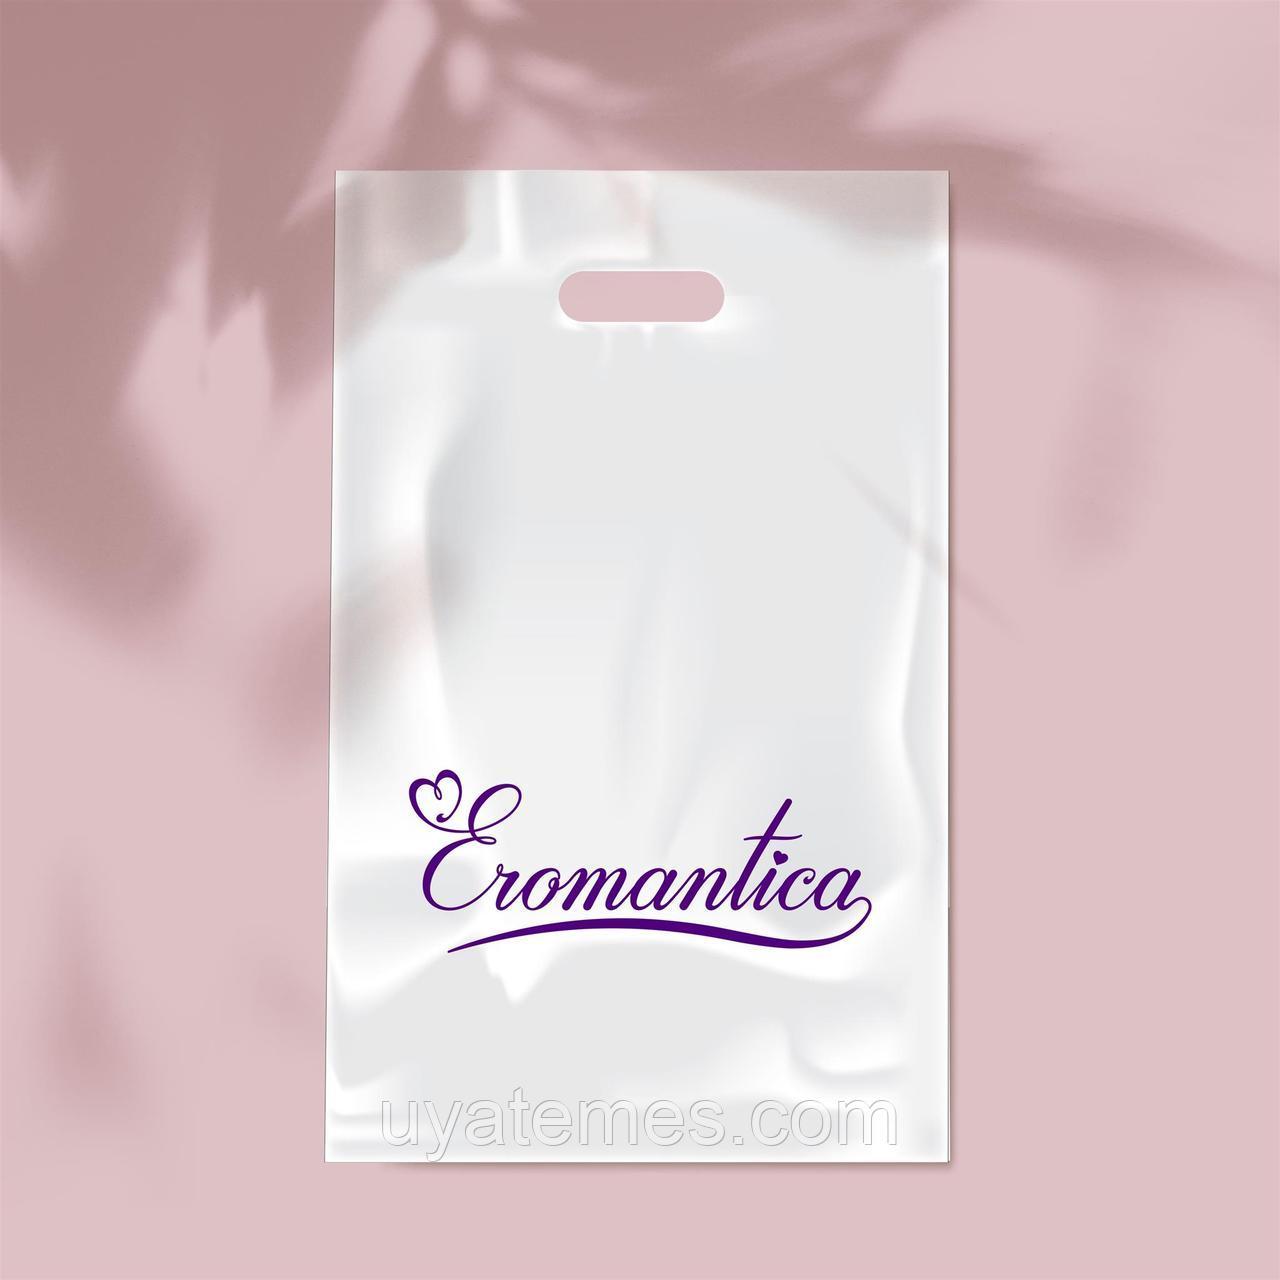 Пакет Eromantica белый, 25*40, упаковка 100 шт